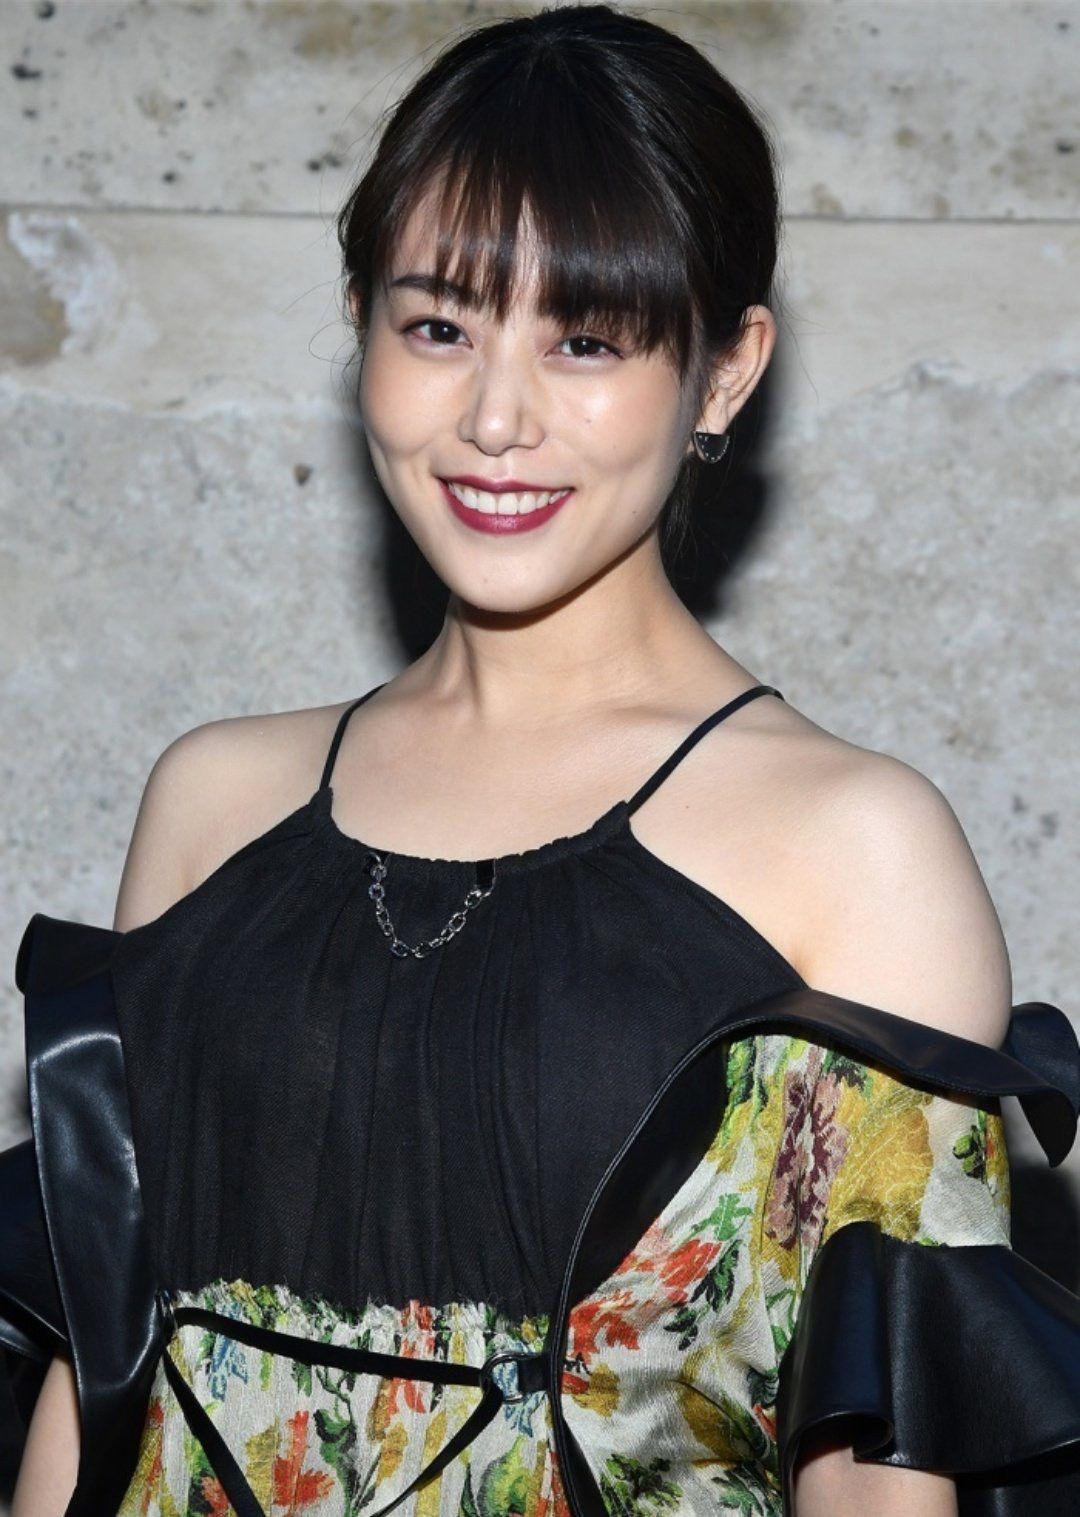 Pin By Kazuhiro Nishida On 高畑光希 Beauty Model Model Actresses